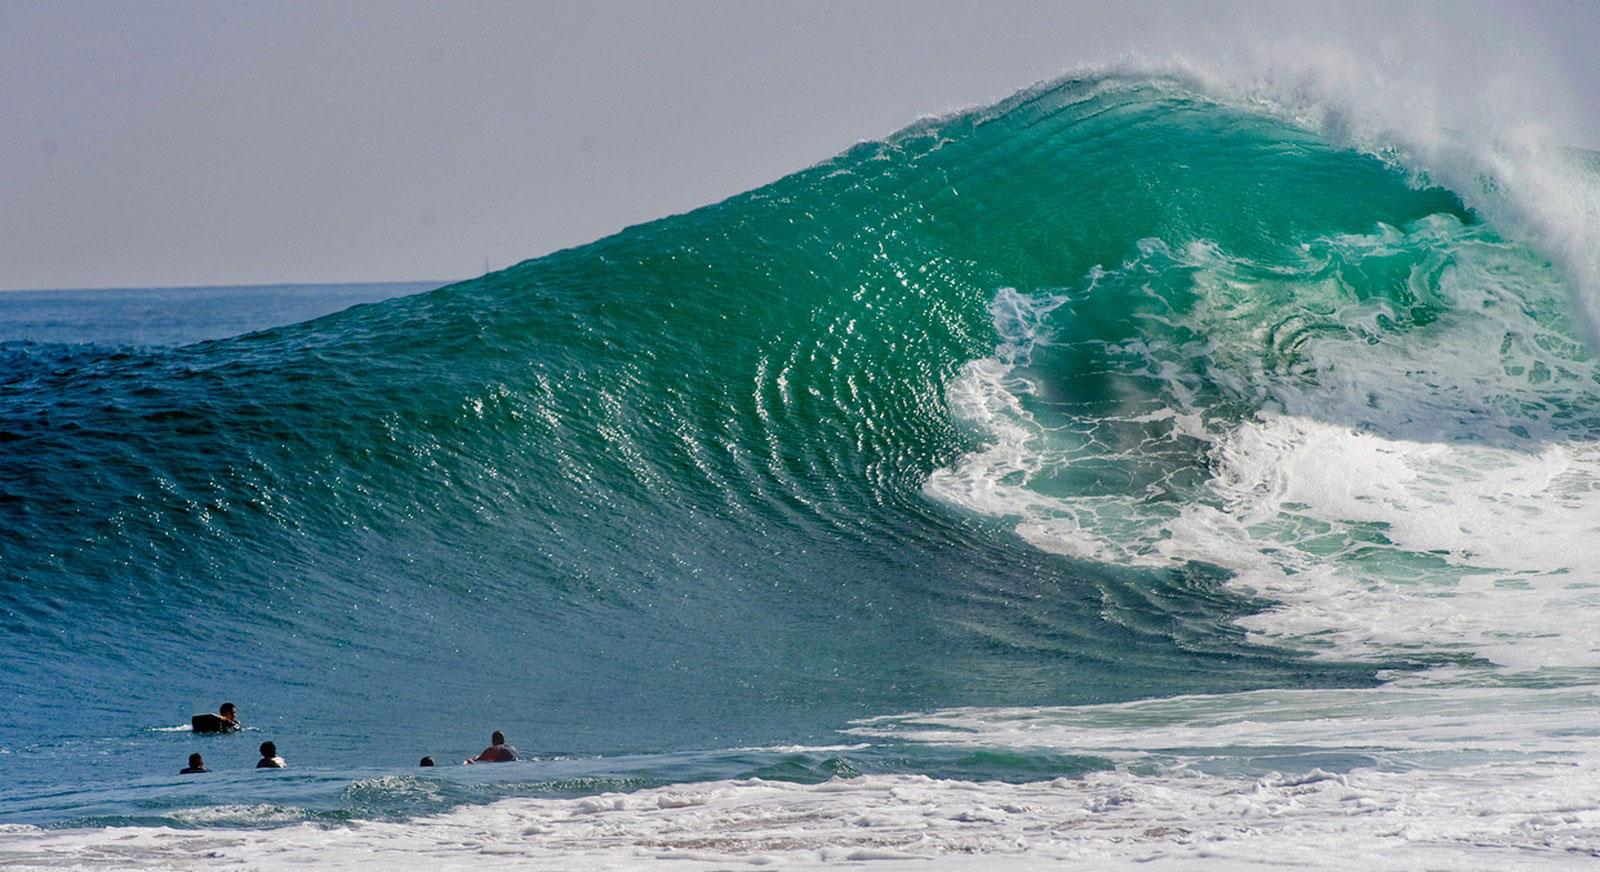 волны у берегов Ньюпорт Бич